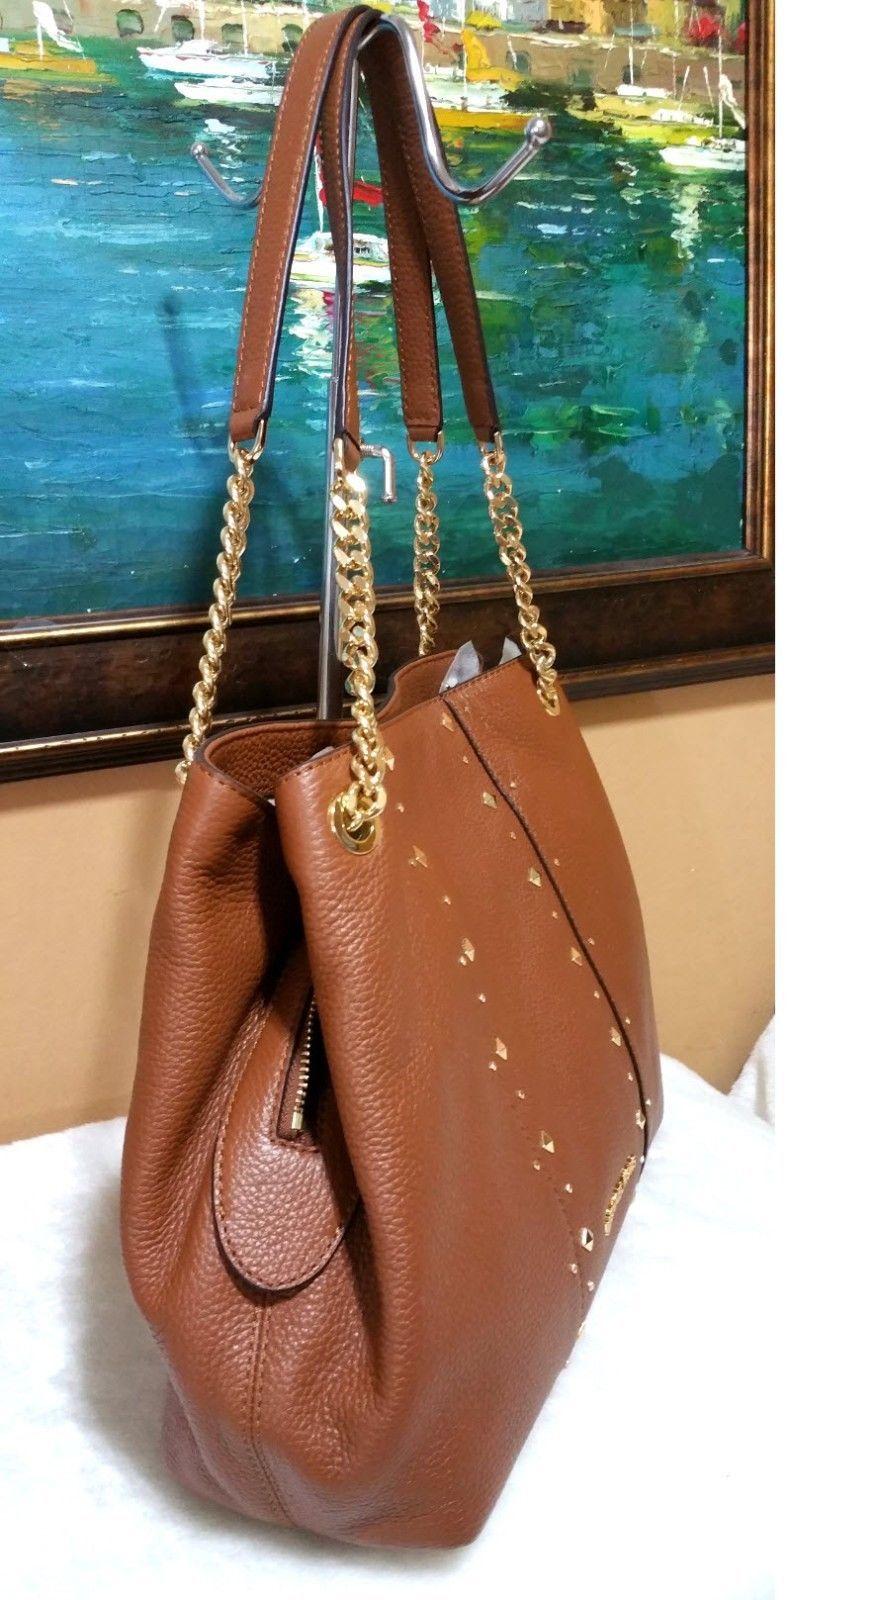 a39fe019e6f MICHAEL KORS jet set chain SHOULDER BAG leather purse stud Raven Brown NWT